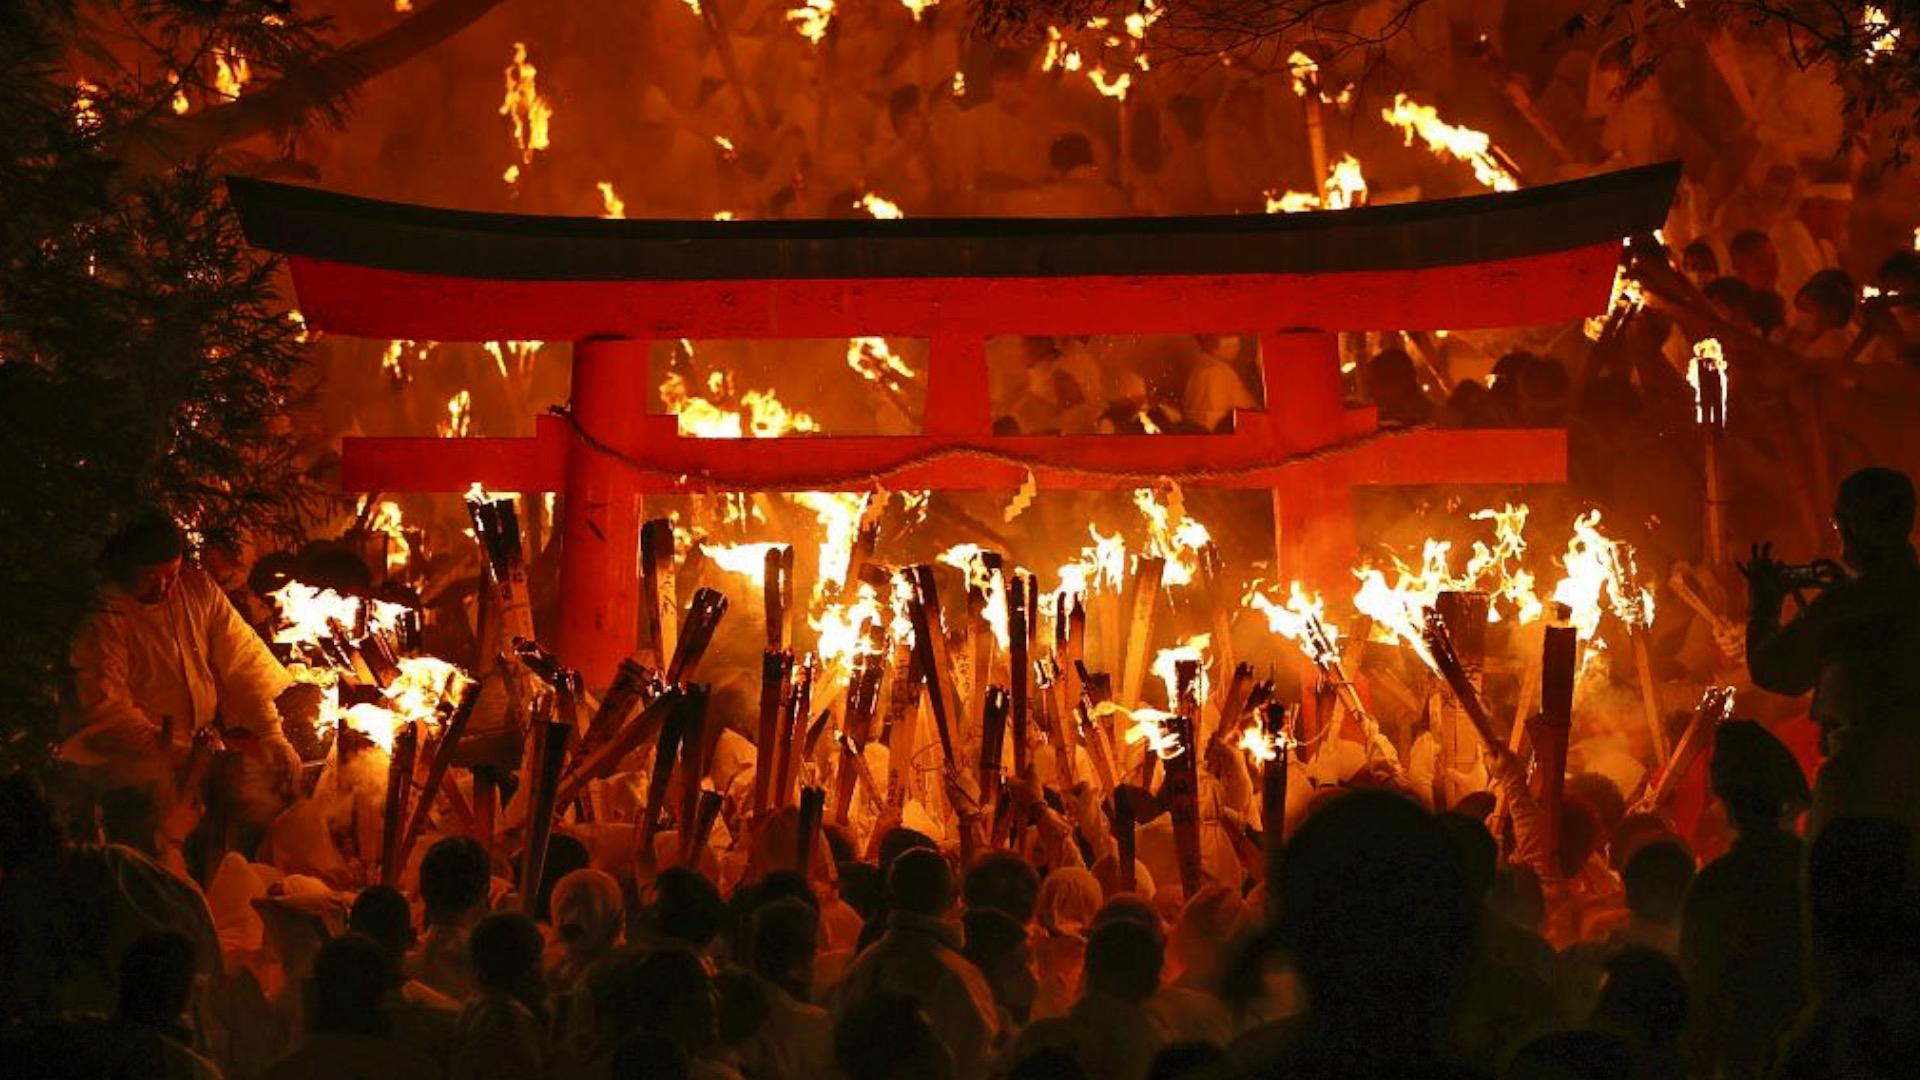 Fire dragon' lights up the night during Oto Matsuri festival